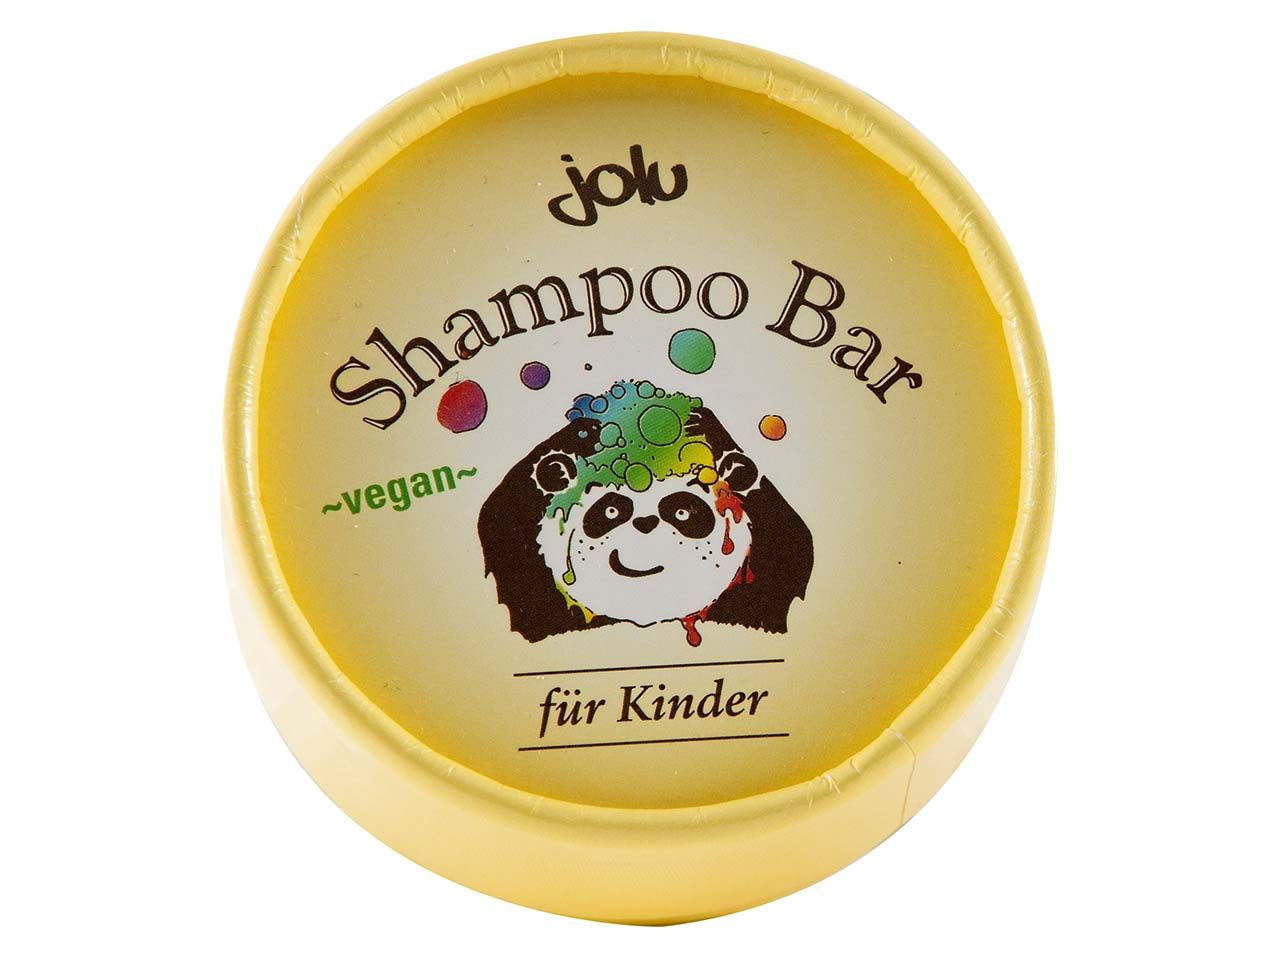 Jolu Shampoo Bar Pappdose